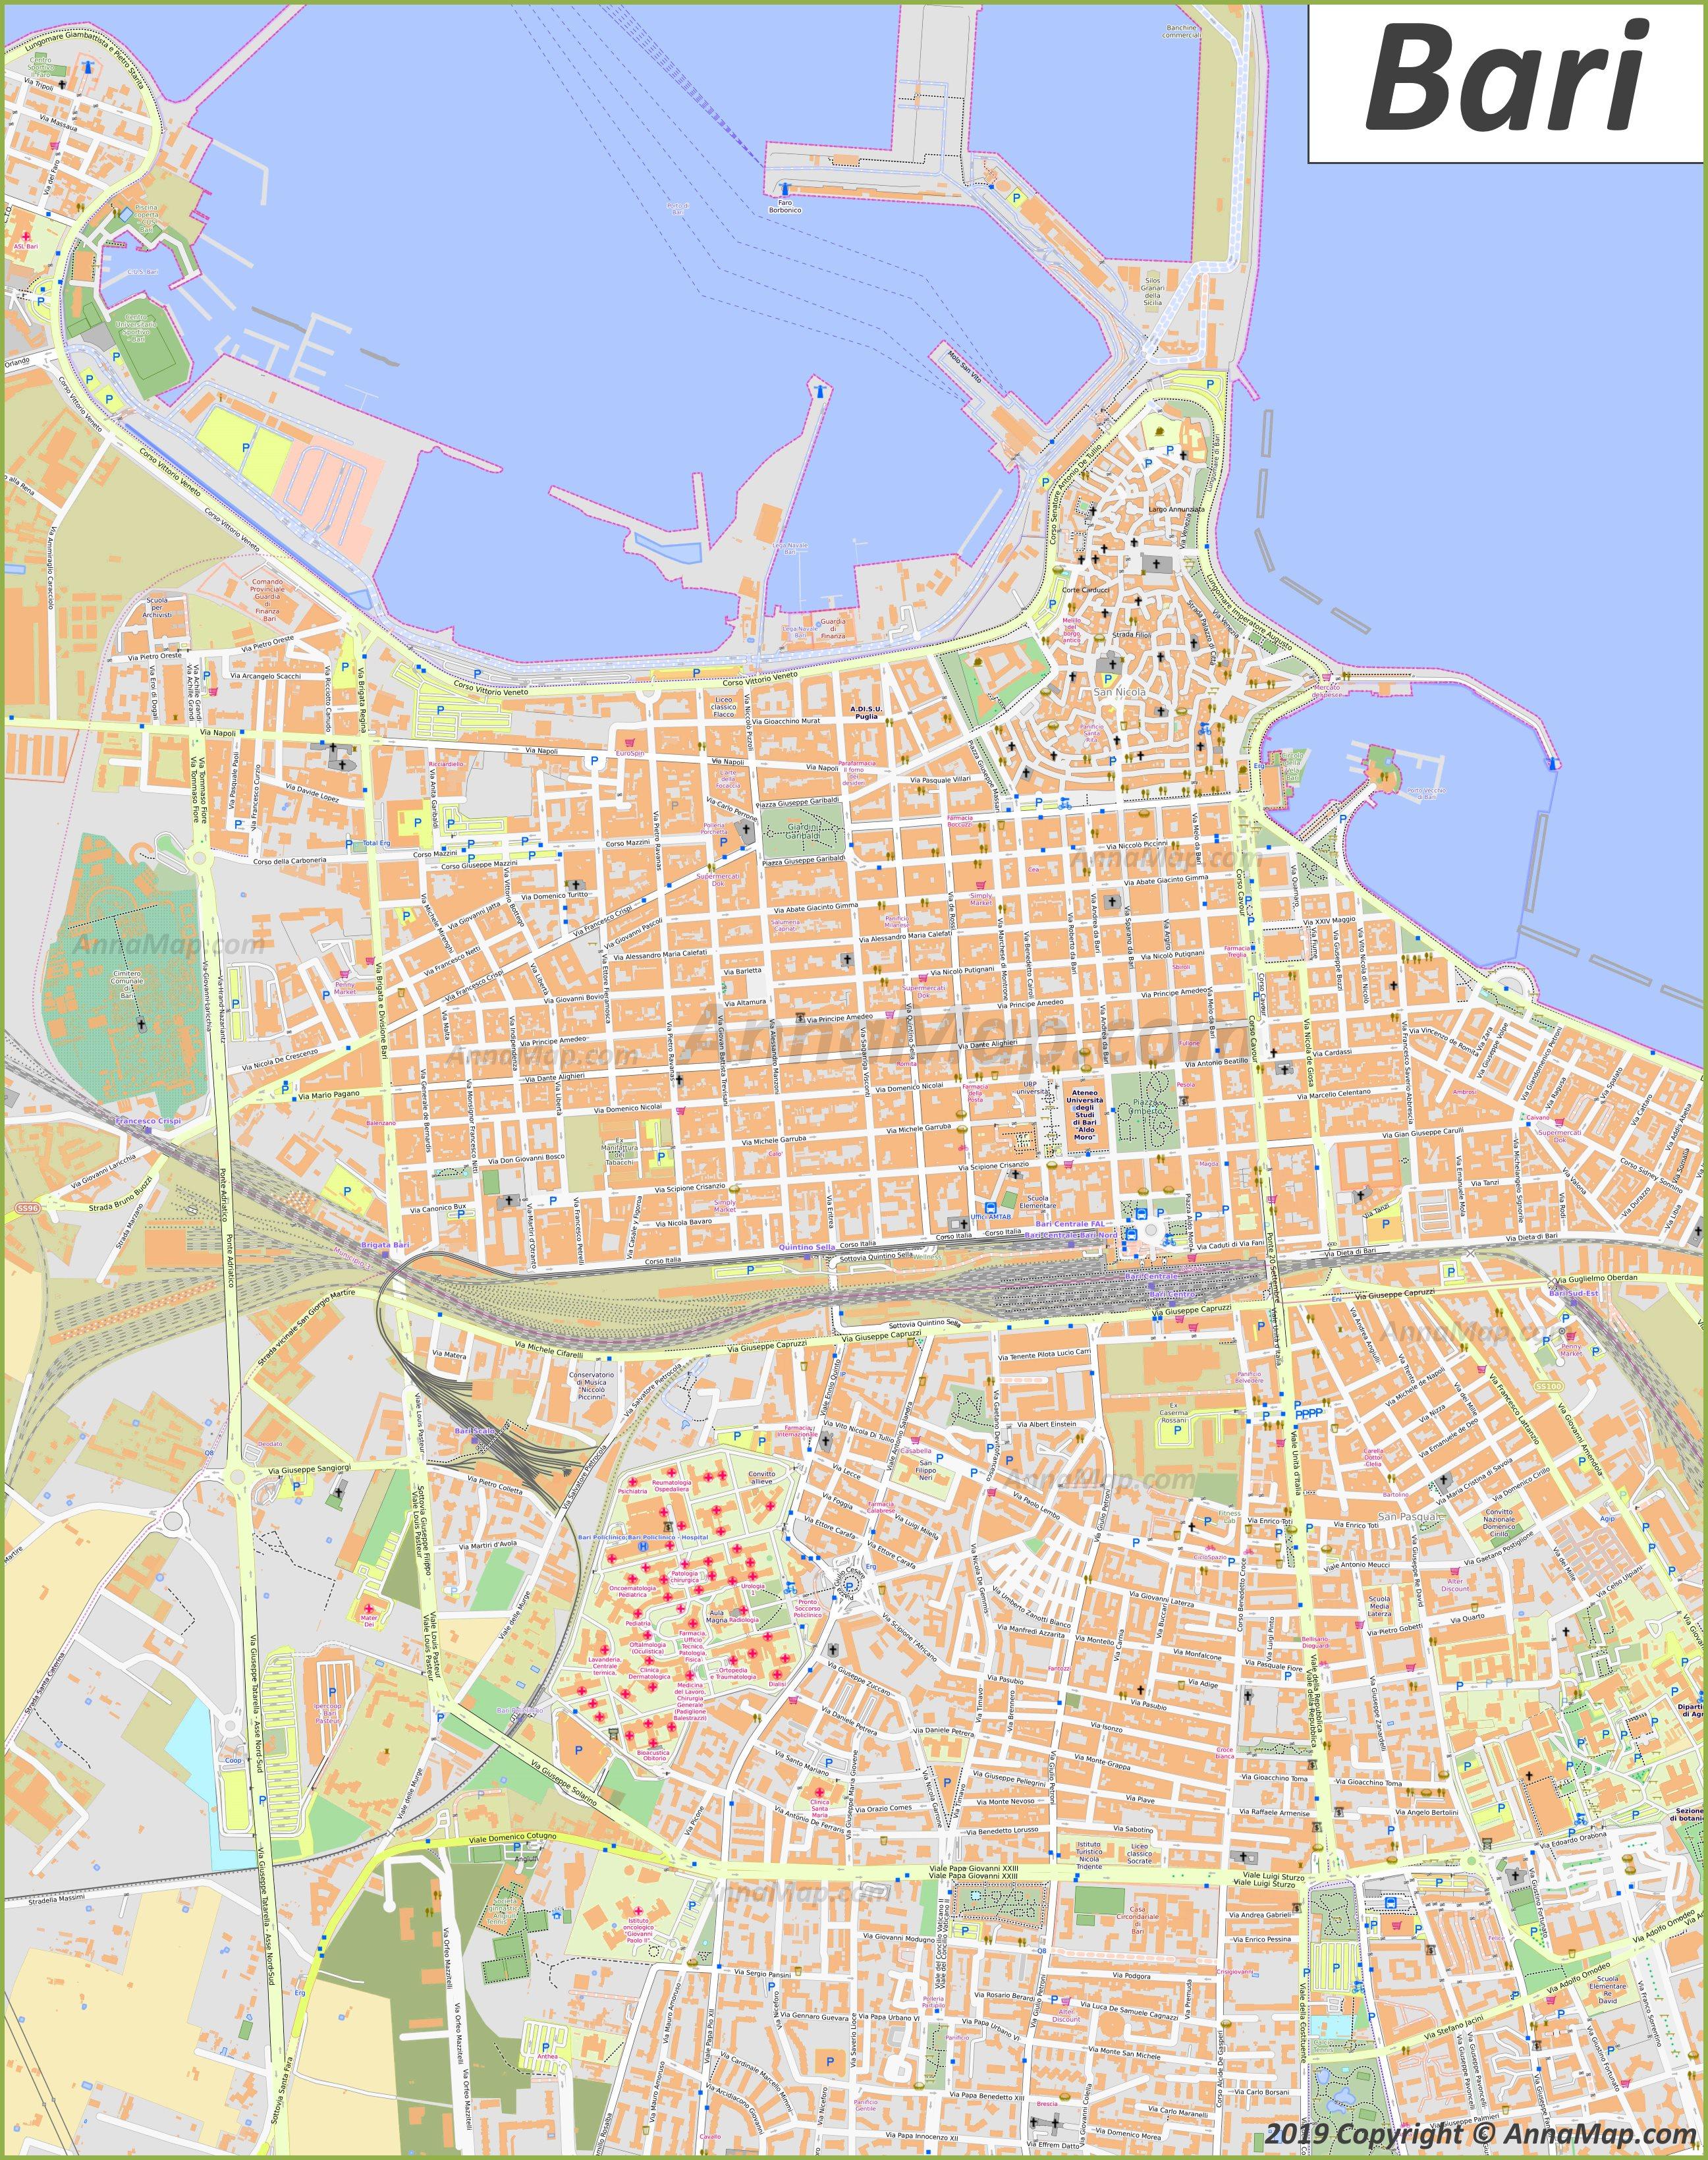 Mapa De Bari Italia.Mapas Turisticos Detallados De Bari Italia Mapas Gratis De Bari Para Imprimir Annamapa Com